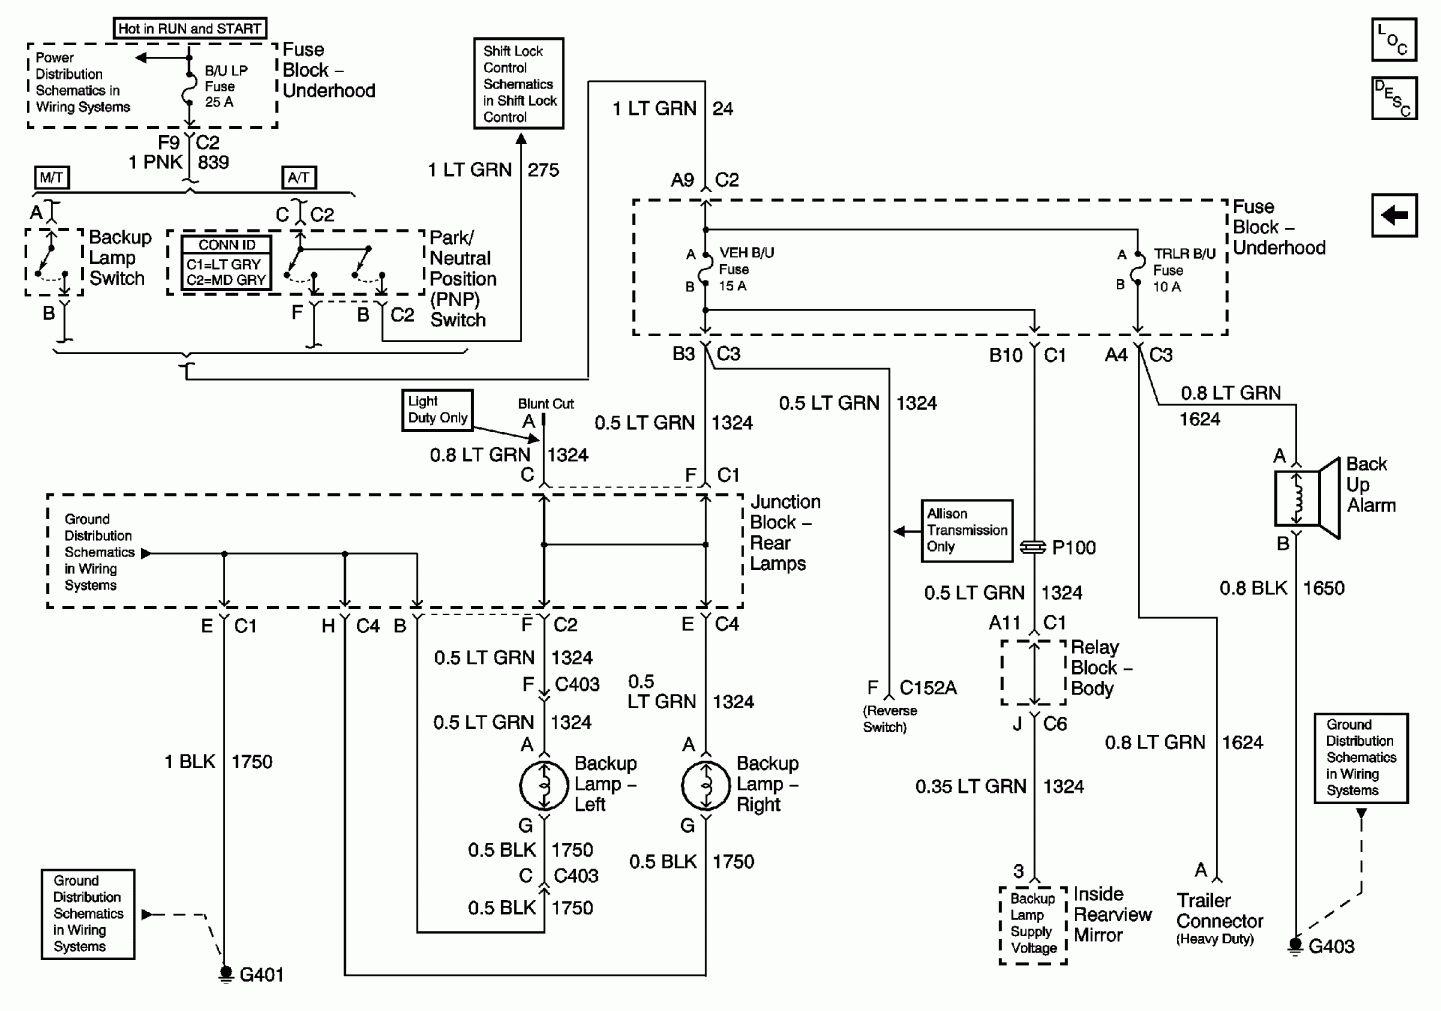 12 Chevy Duramax Truck Wiring Diagram Truck Diagram Wiringg Net Chevy Duramax Duramax Chevy Silverado Hd